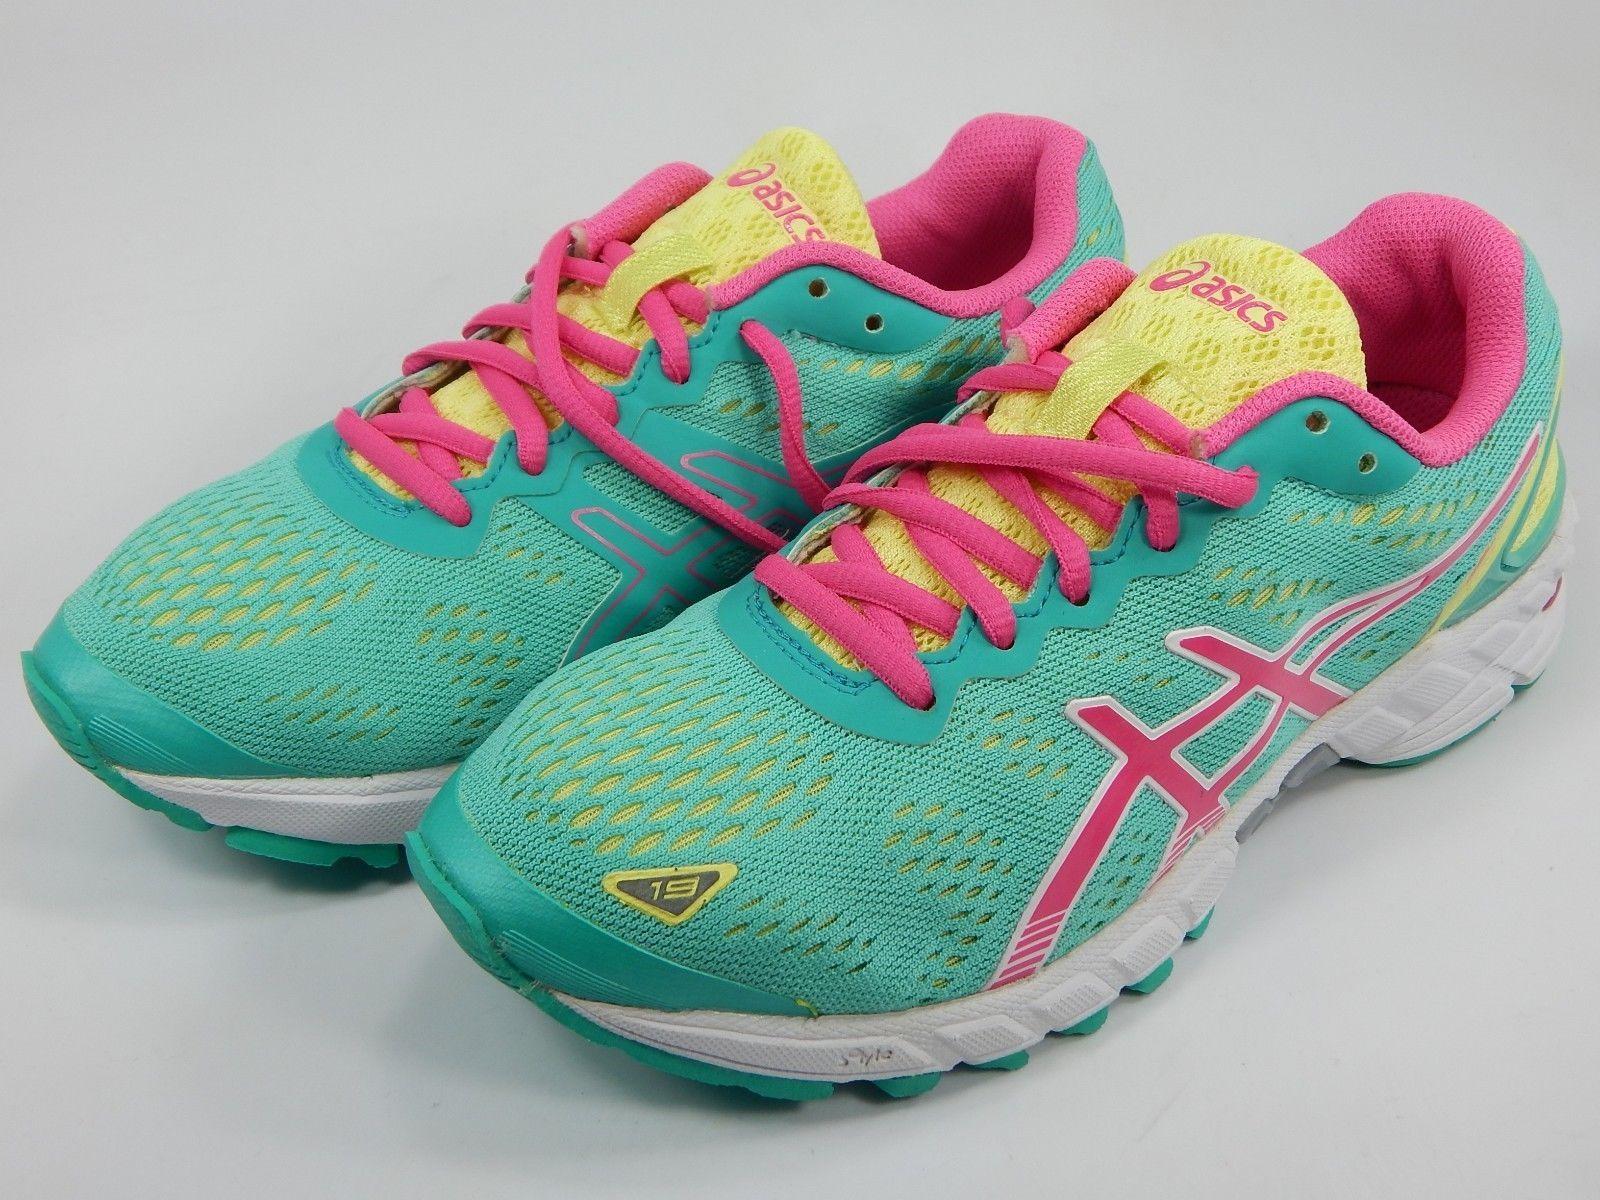 Asics Gel DS Trainer 19 Women's Running Shoes Size 6 M (B) EU 37 Green T455N